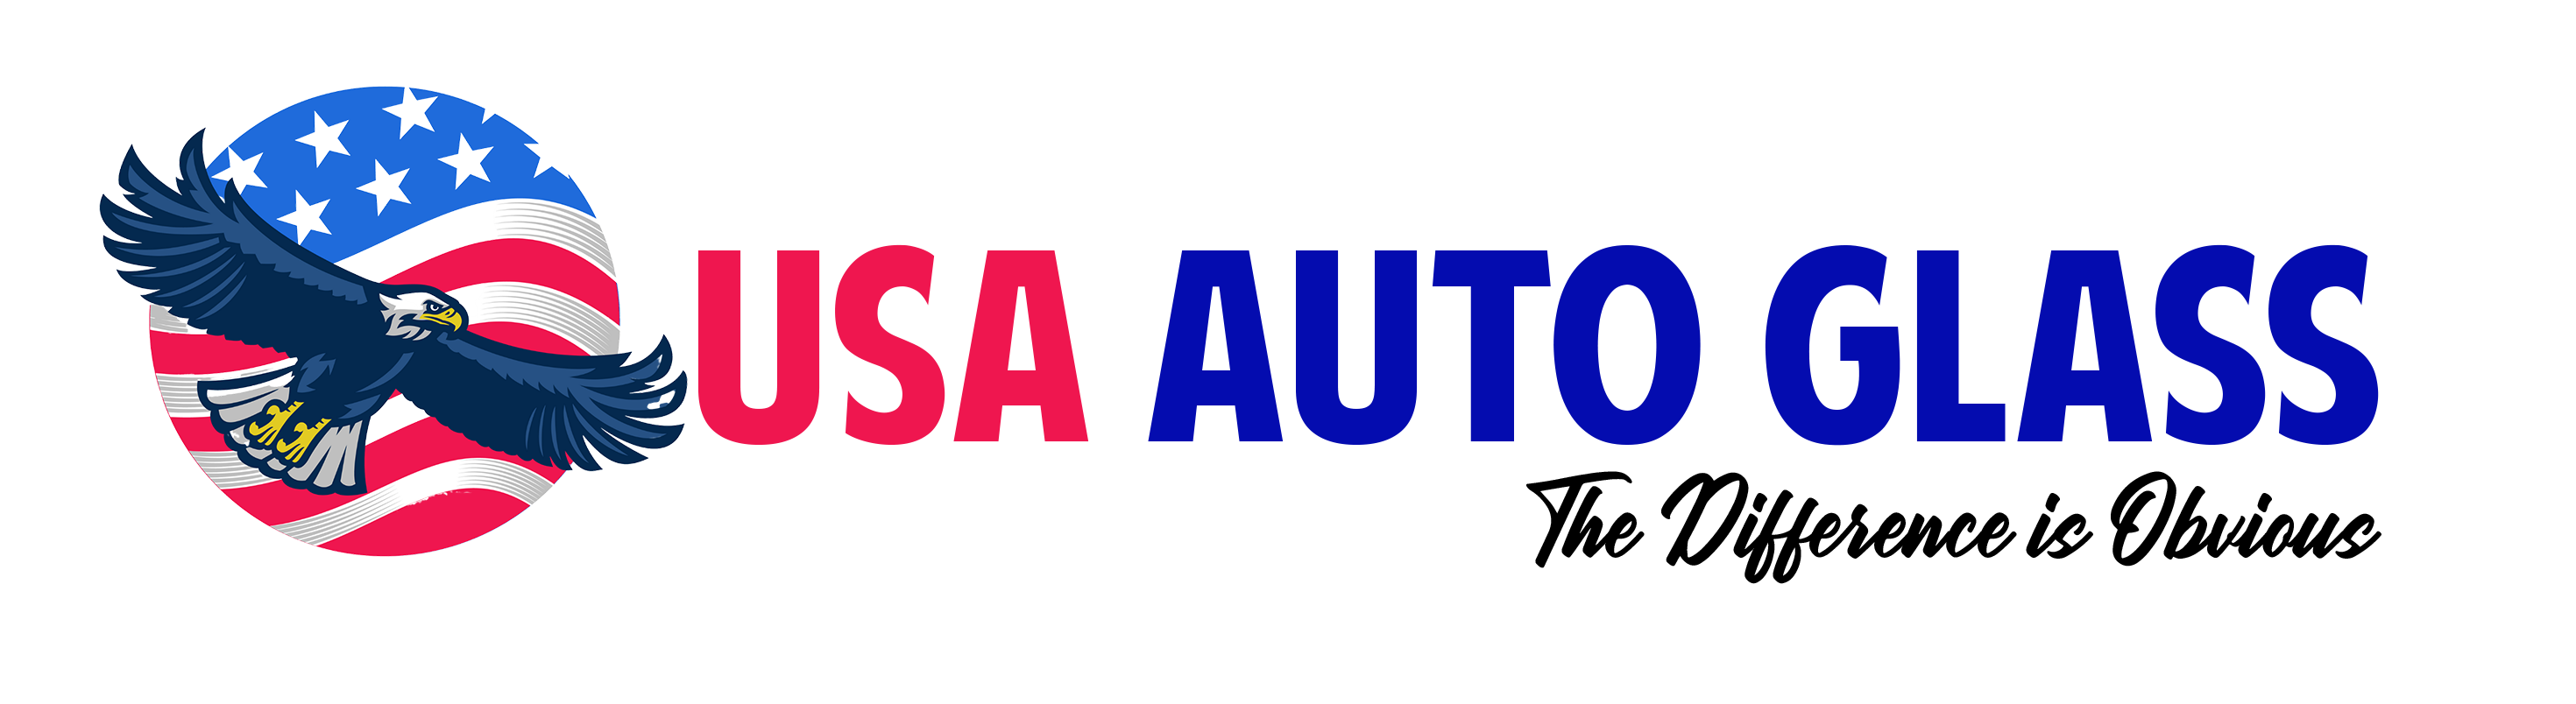 usa-auto-glass Logo